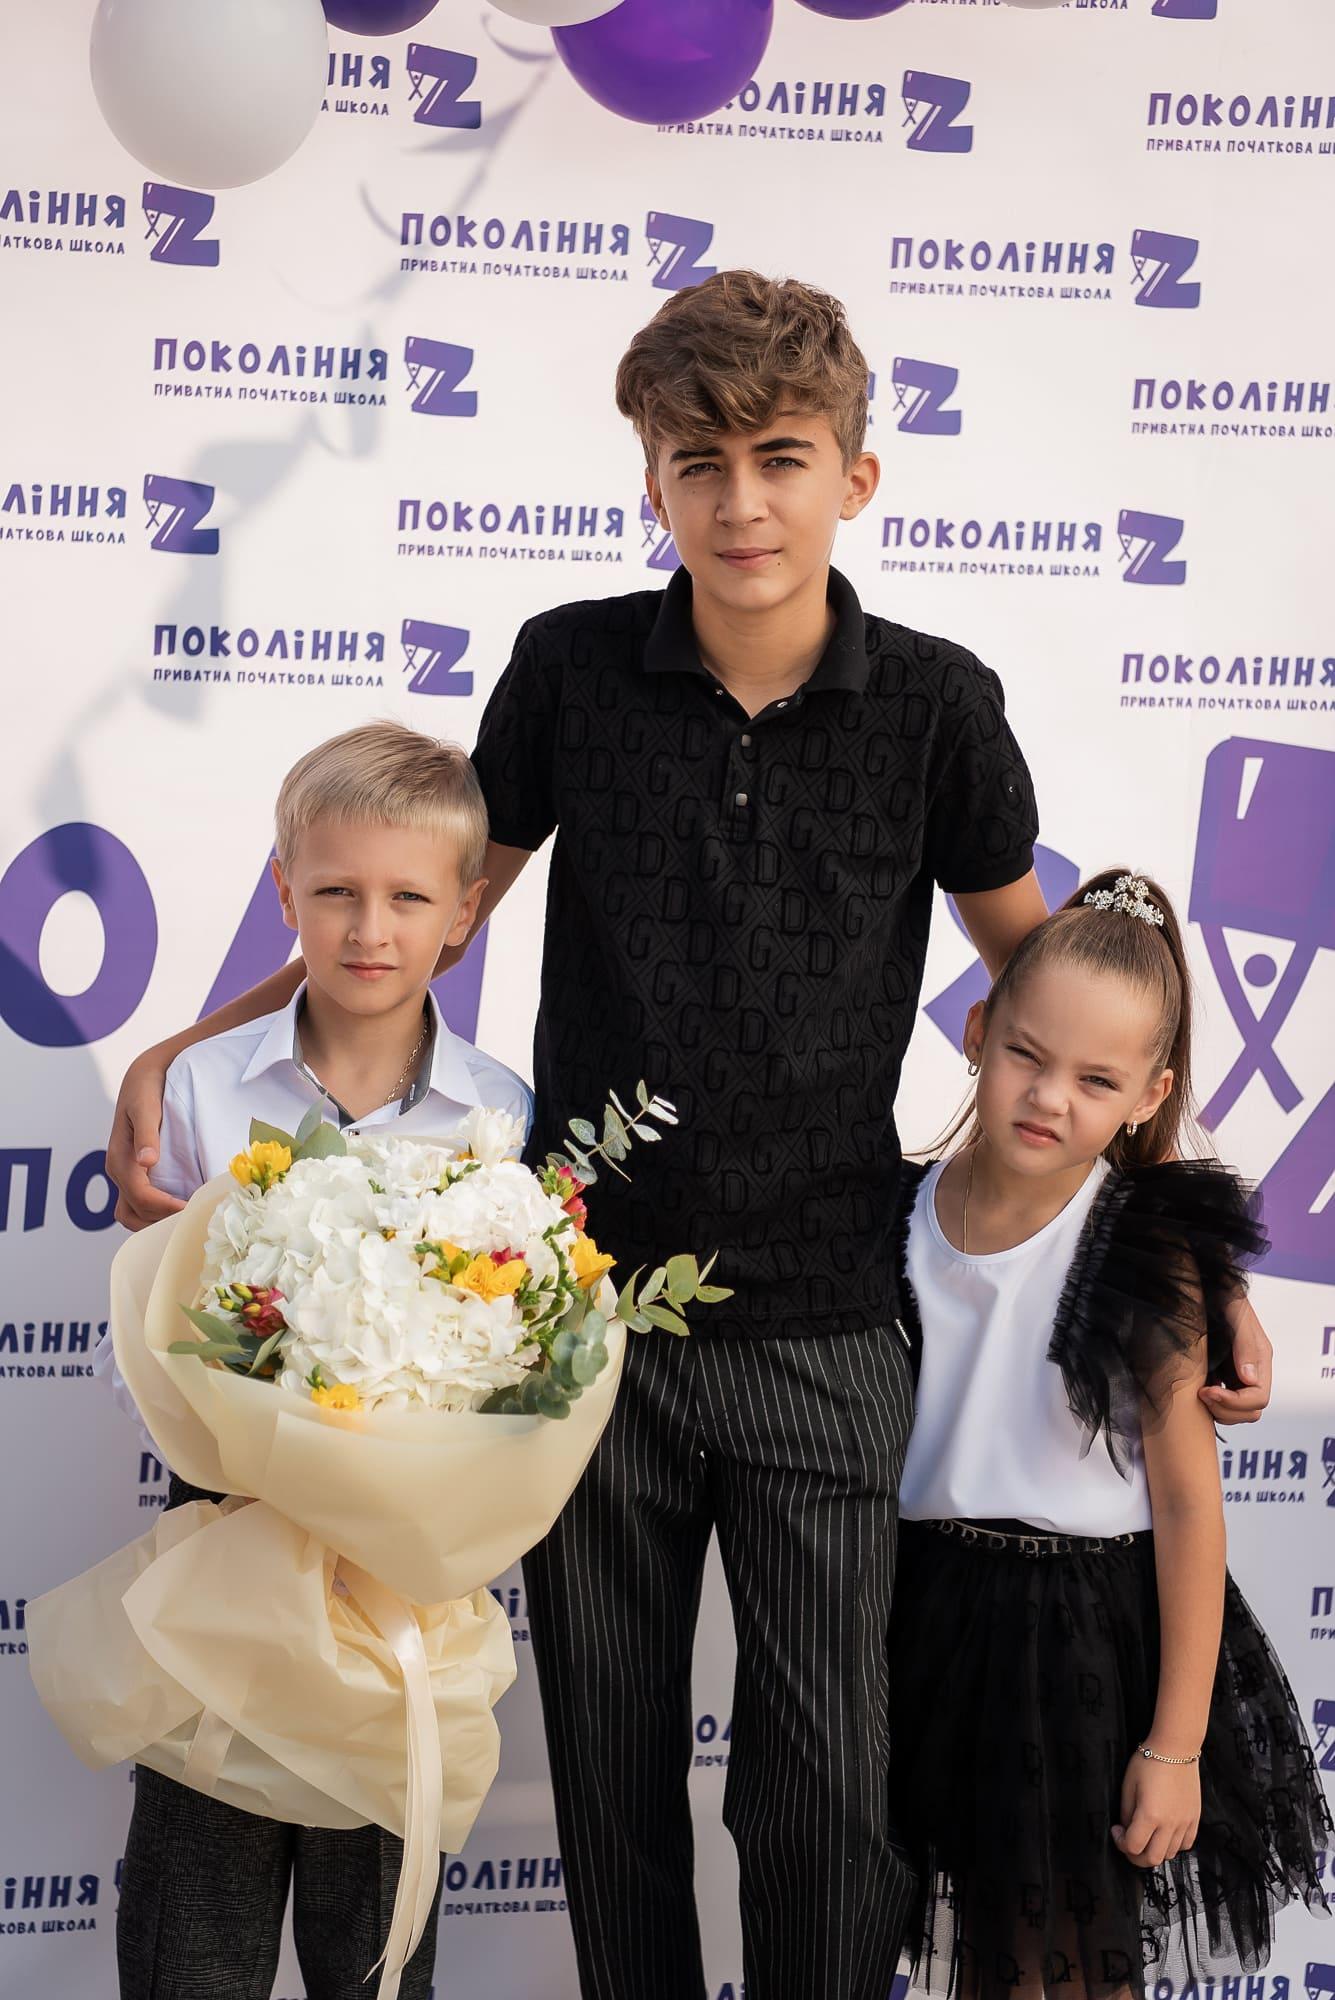 https://akademia-detstva.od.ua/app/uploads/2021/09/104.jpg